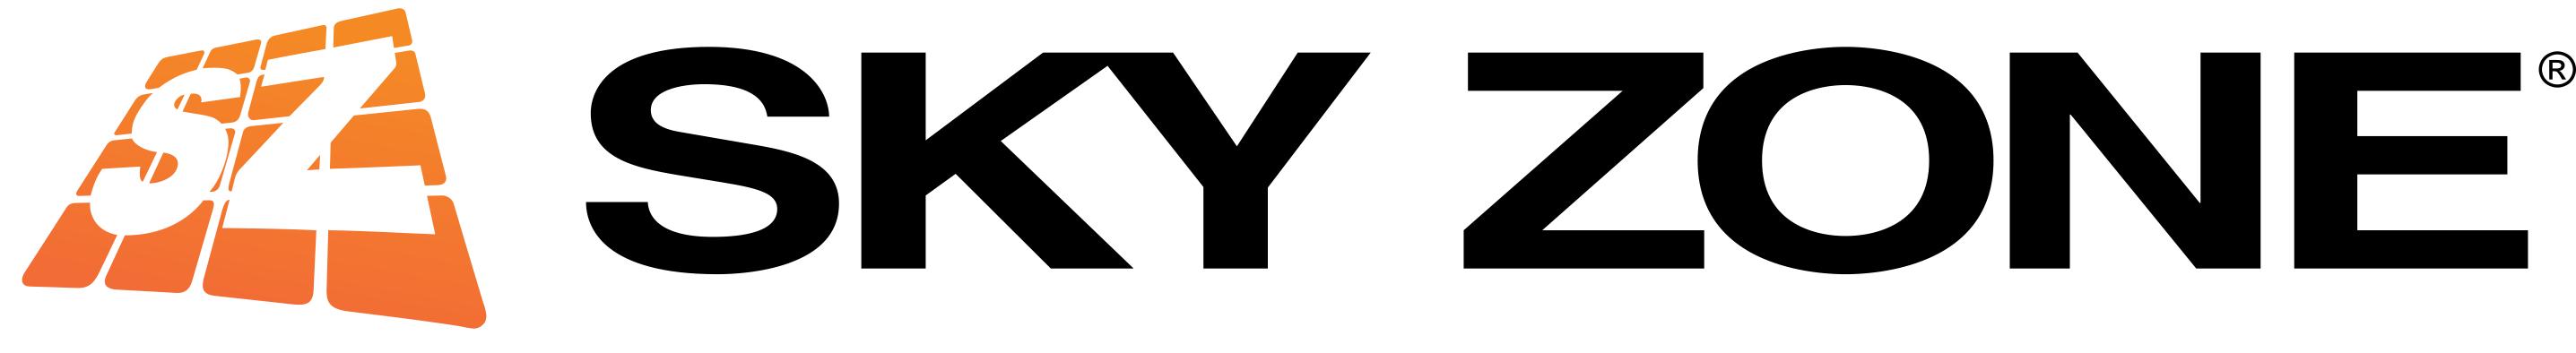 Sky Zone Logo - Alumni Benefits